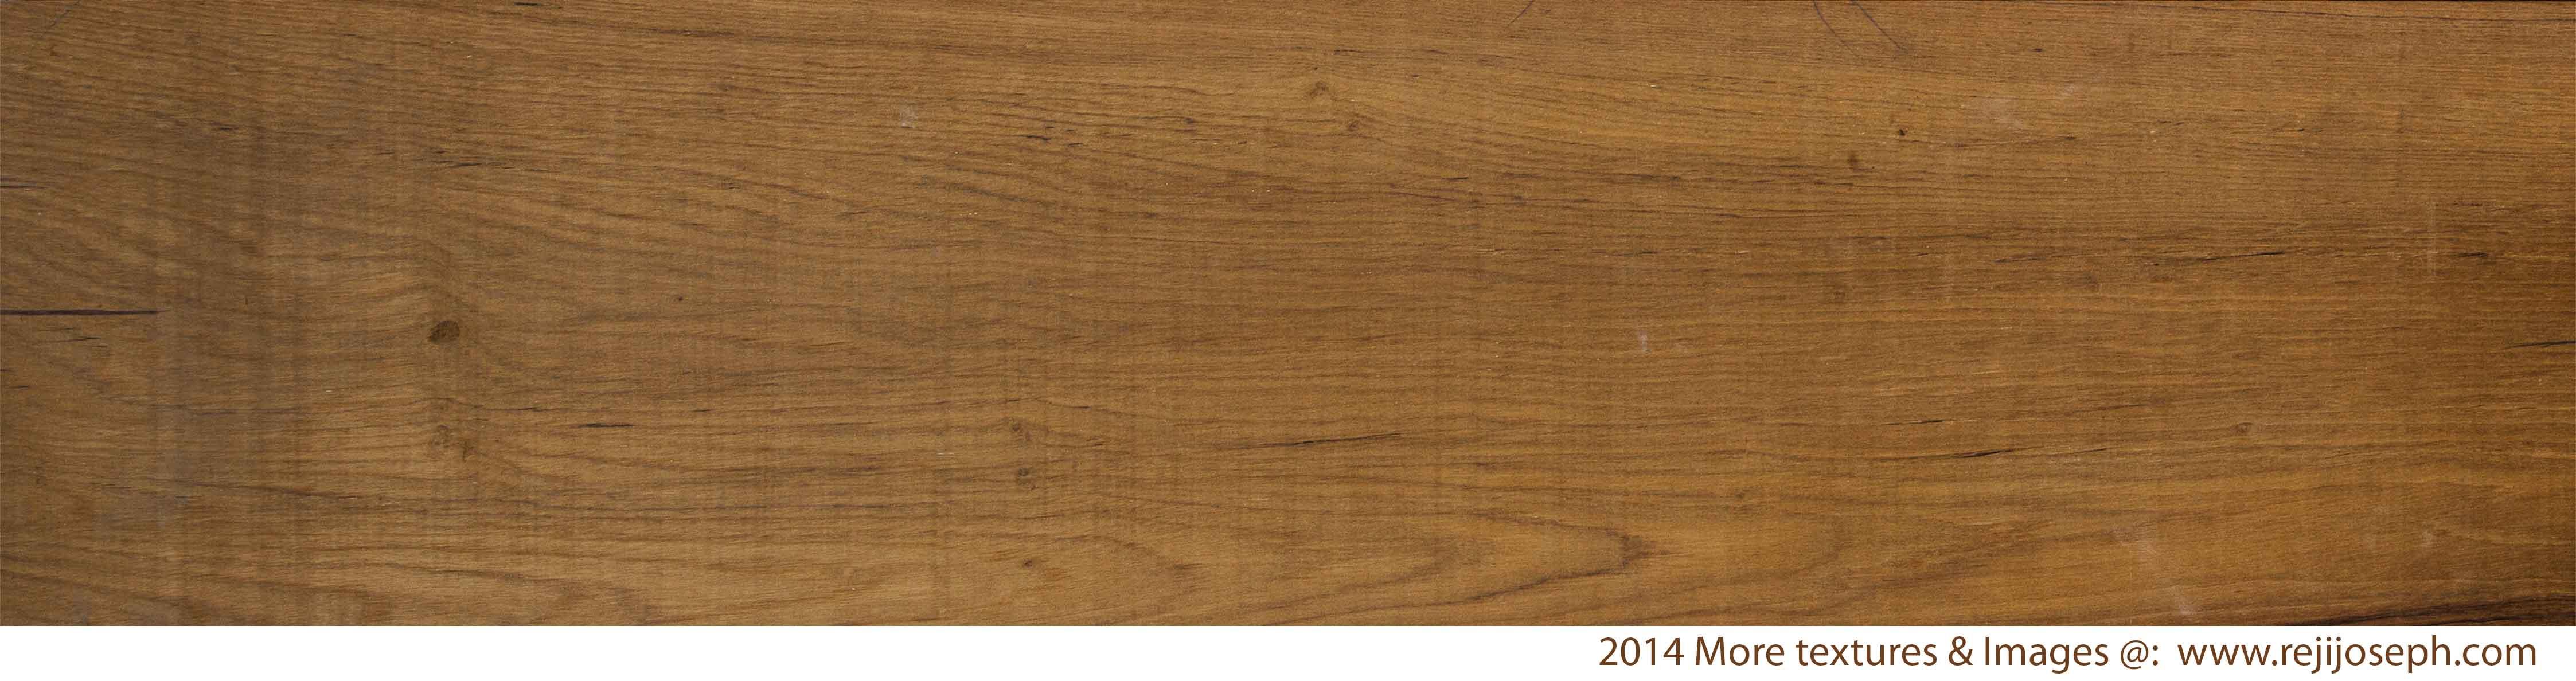 Plane Wood texture 00005